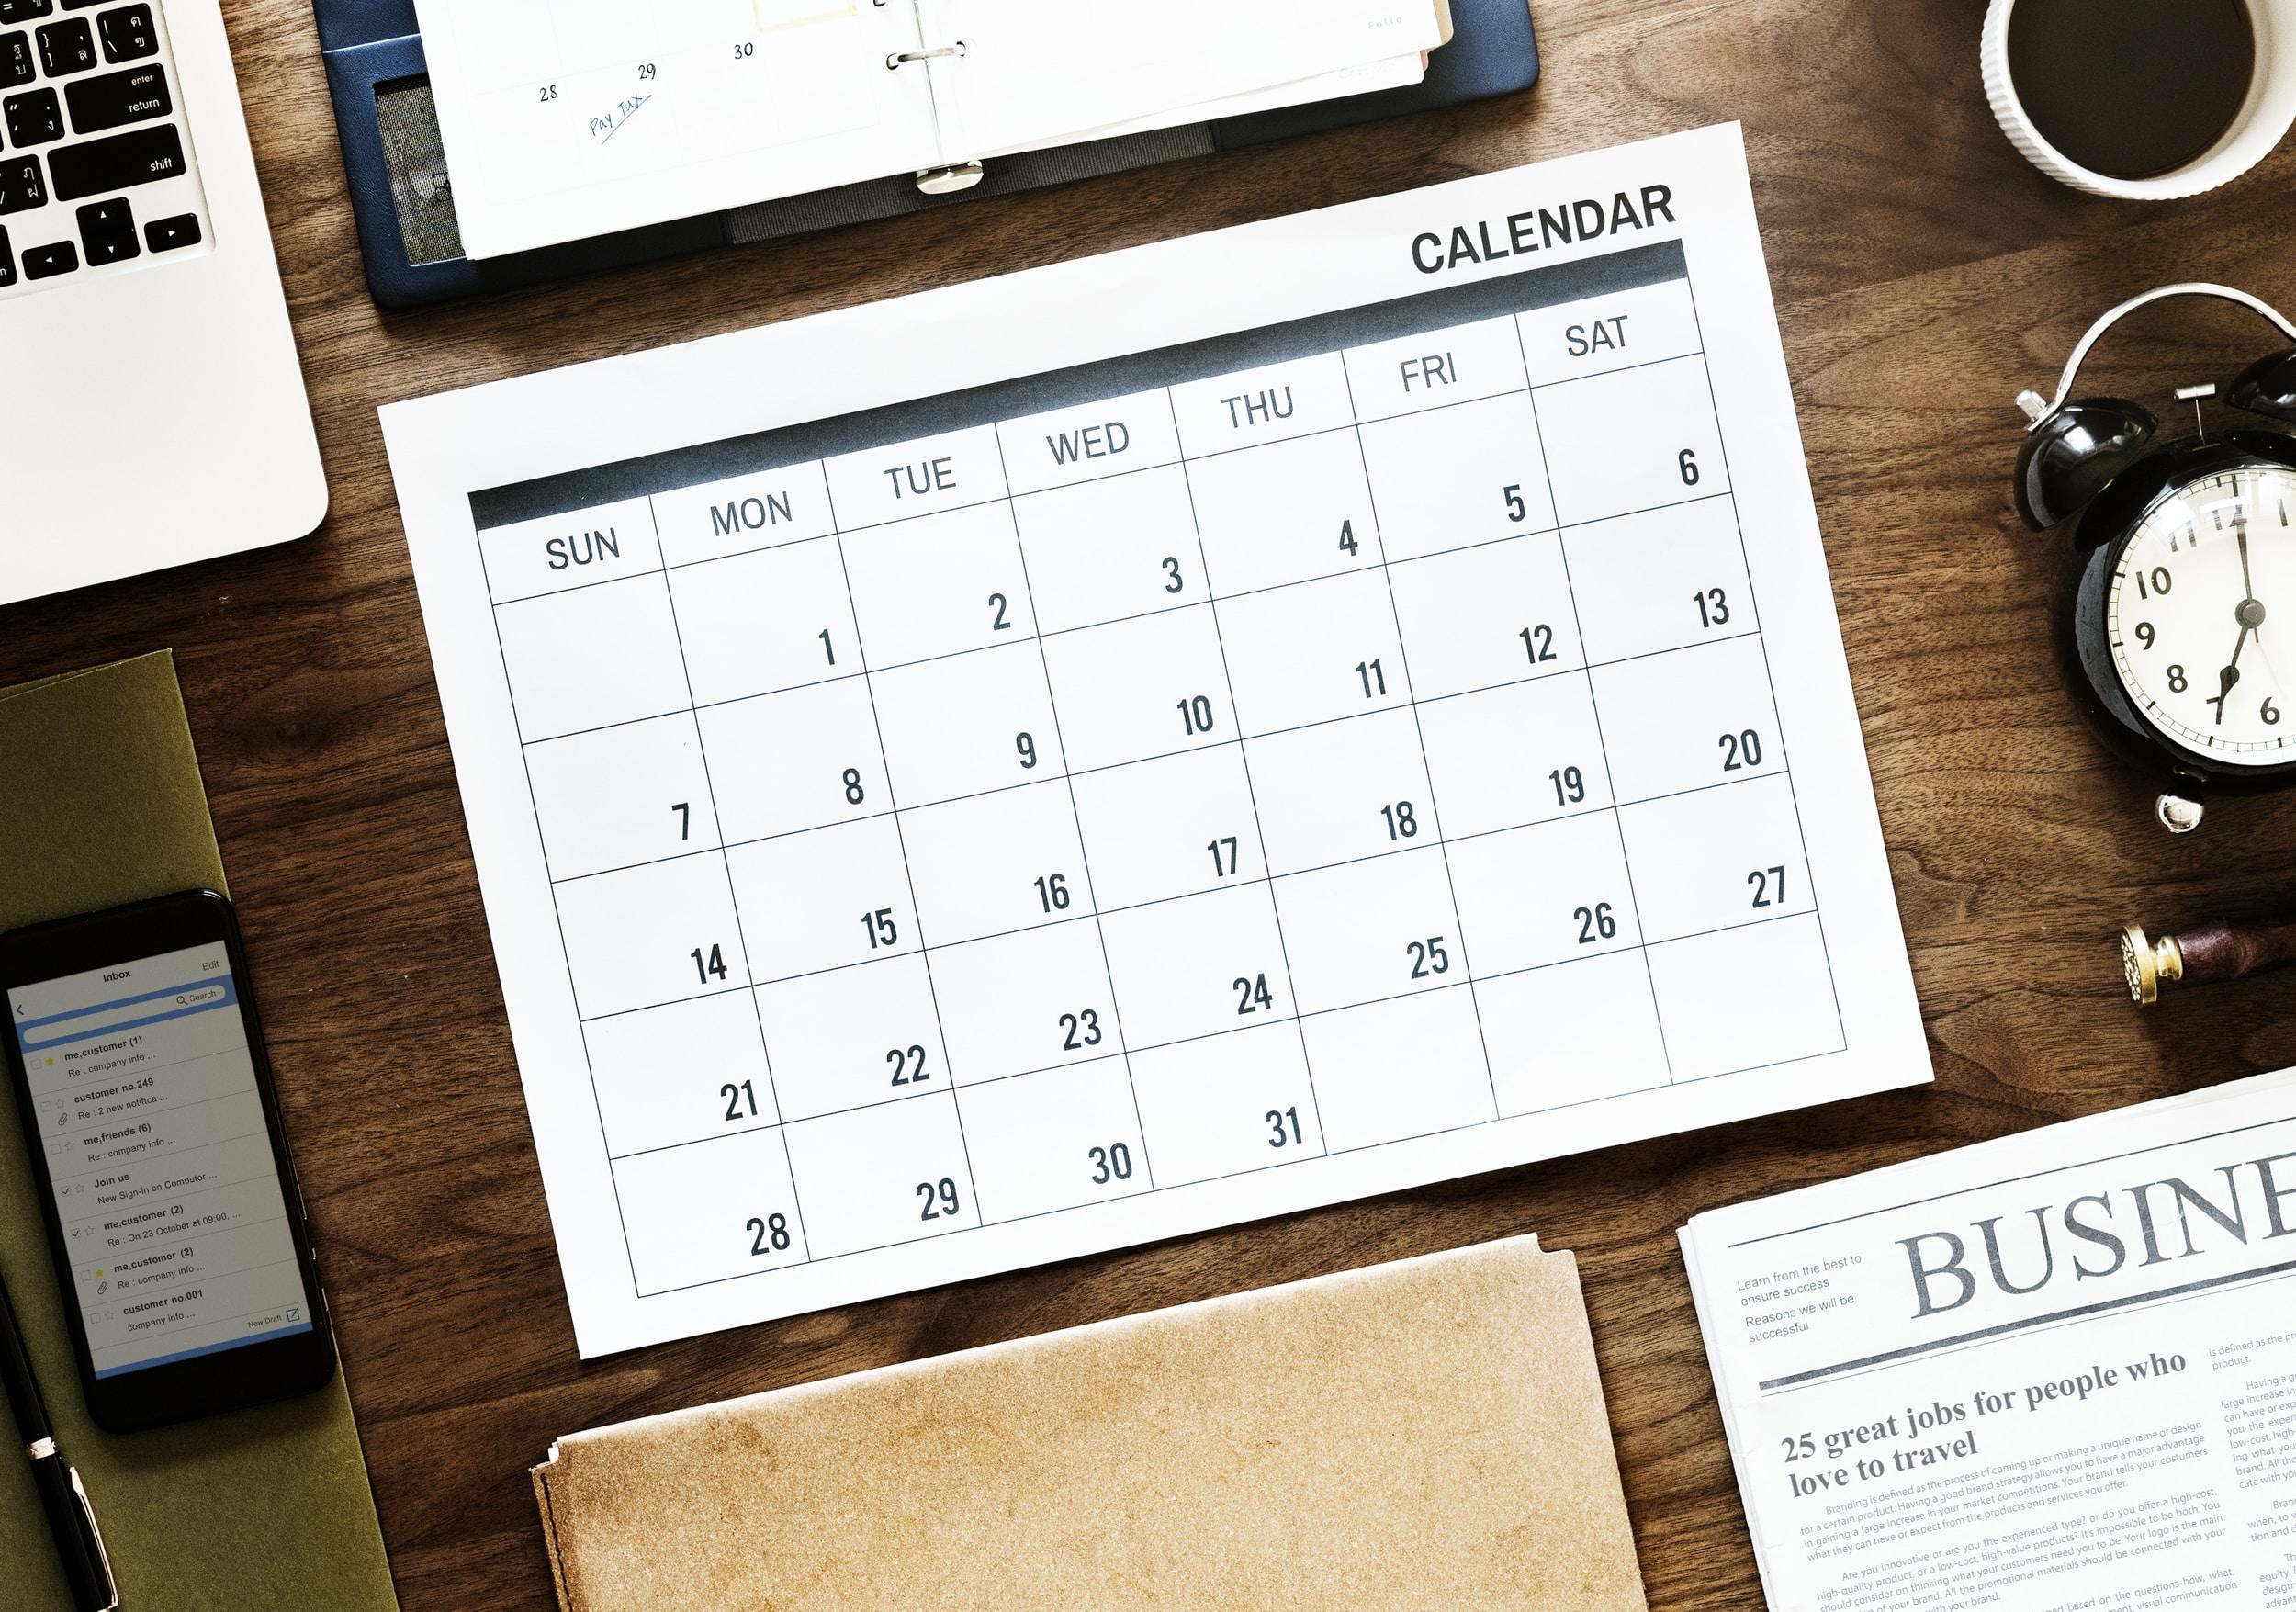 31-days calendar near round white analog alarm clock